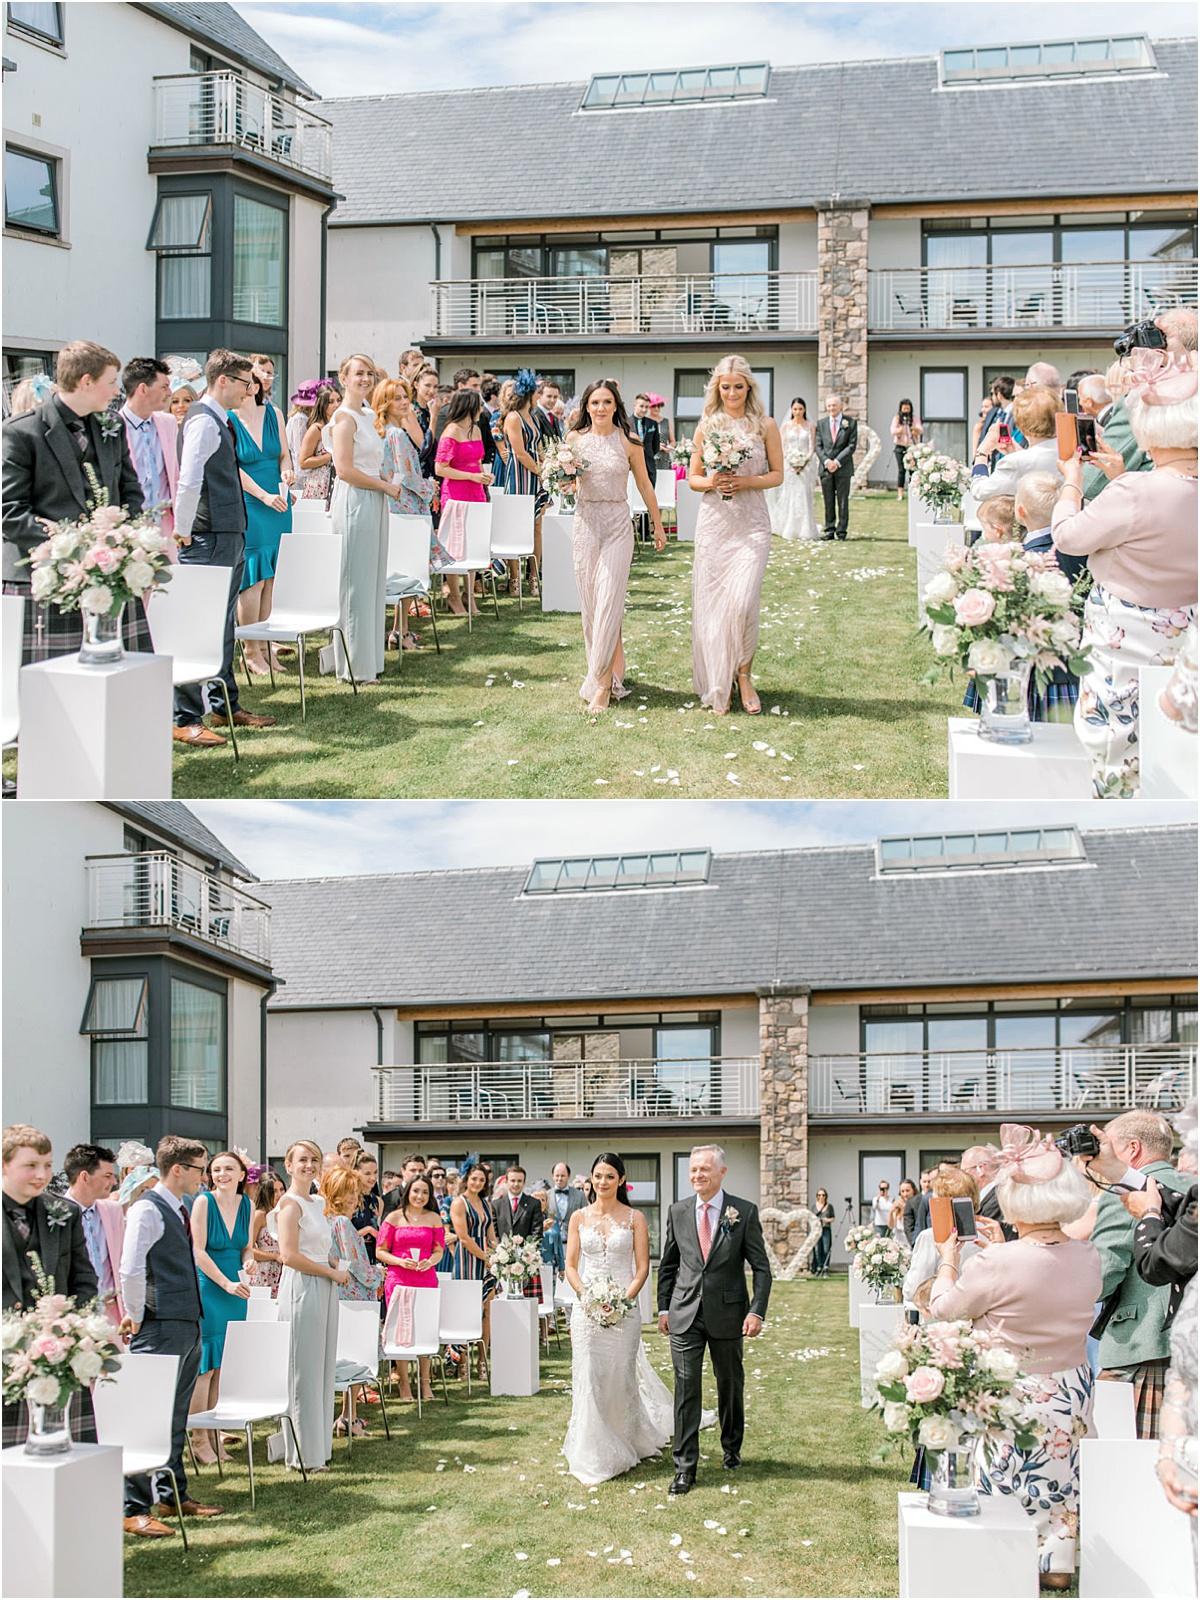 Fine Art Wedding Photographers,Portavadie Marina Wedding,The Gibsons Photography,elegant wedding photographers glasgow,light and bright,light and bright wedding photographers scotland,romantic photographers Scotland,west coast Scottish Wedding,